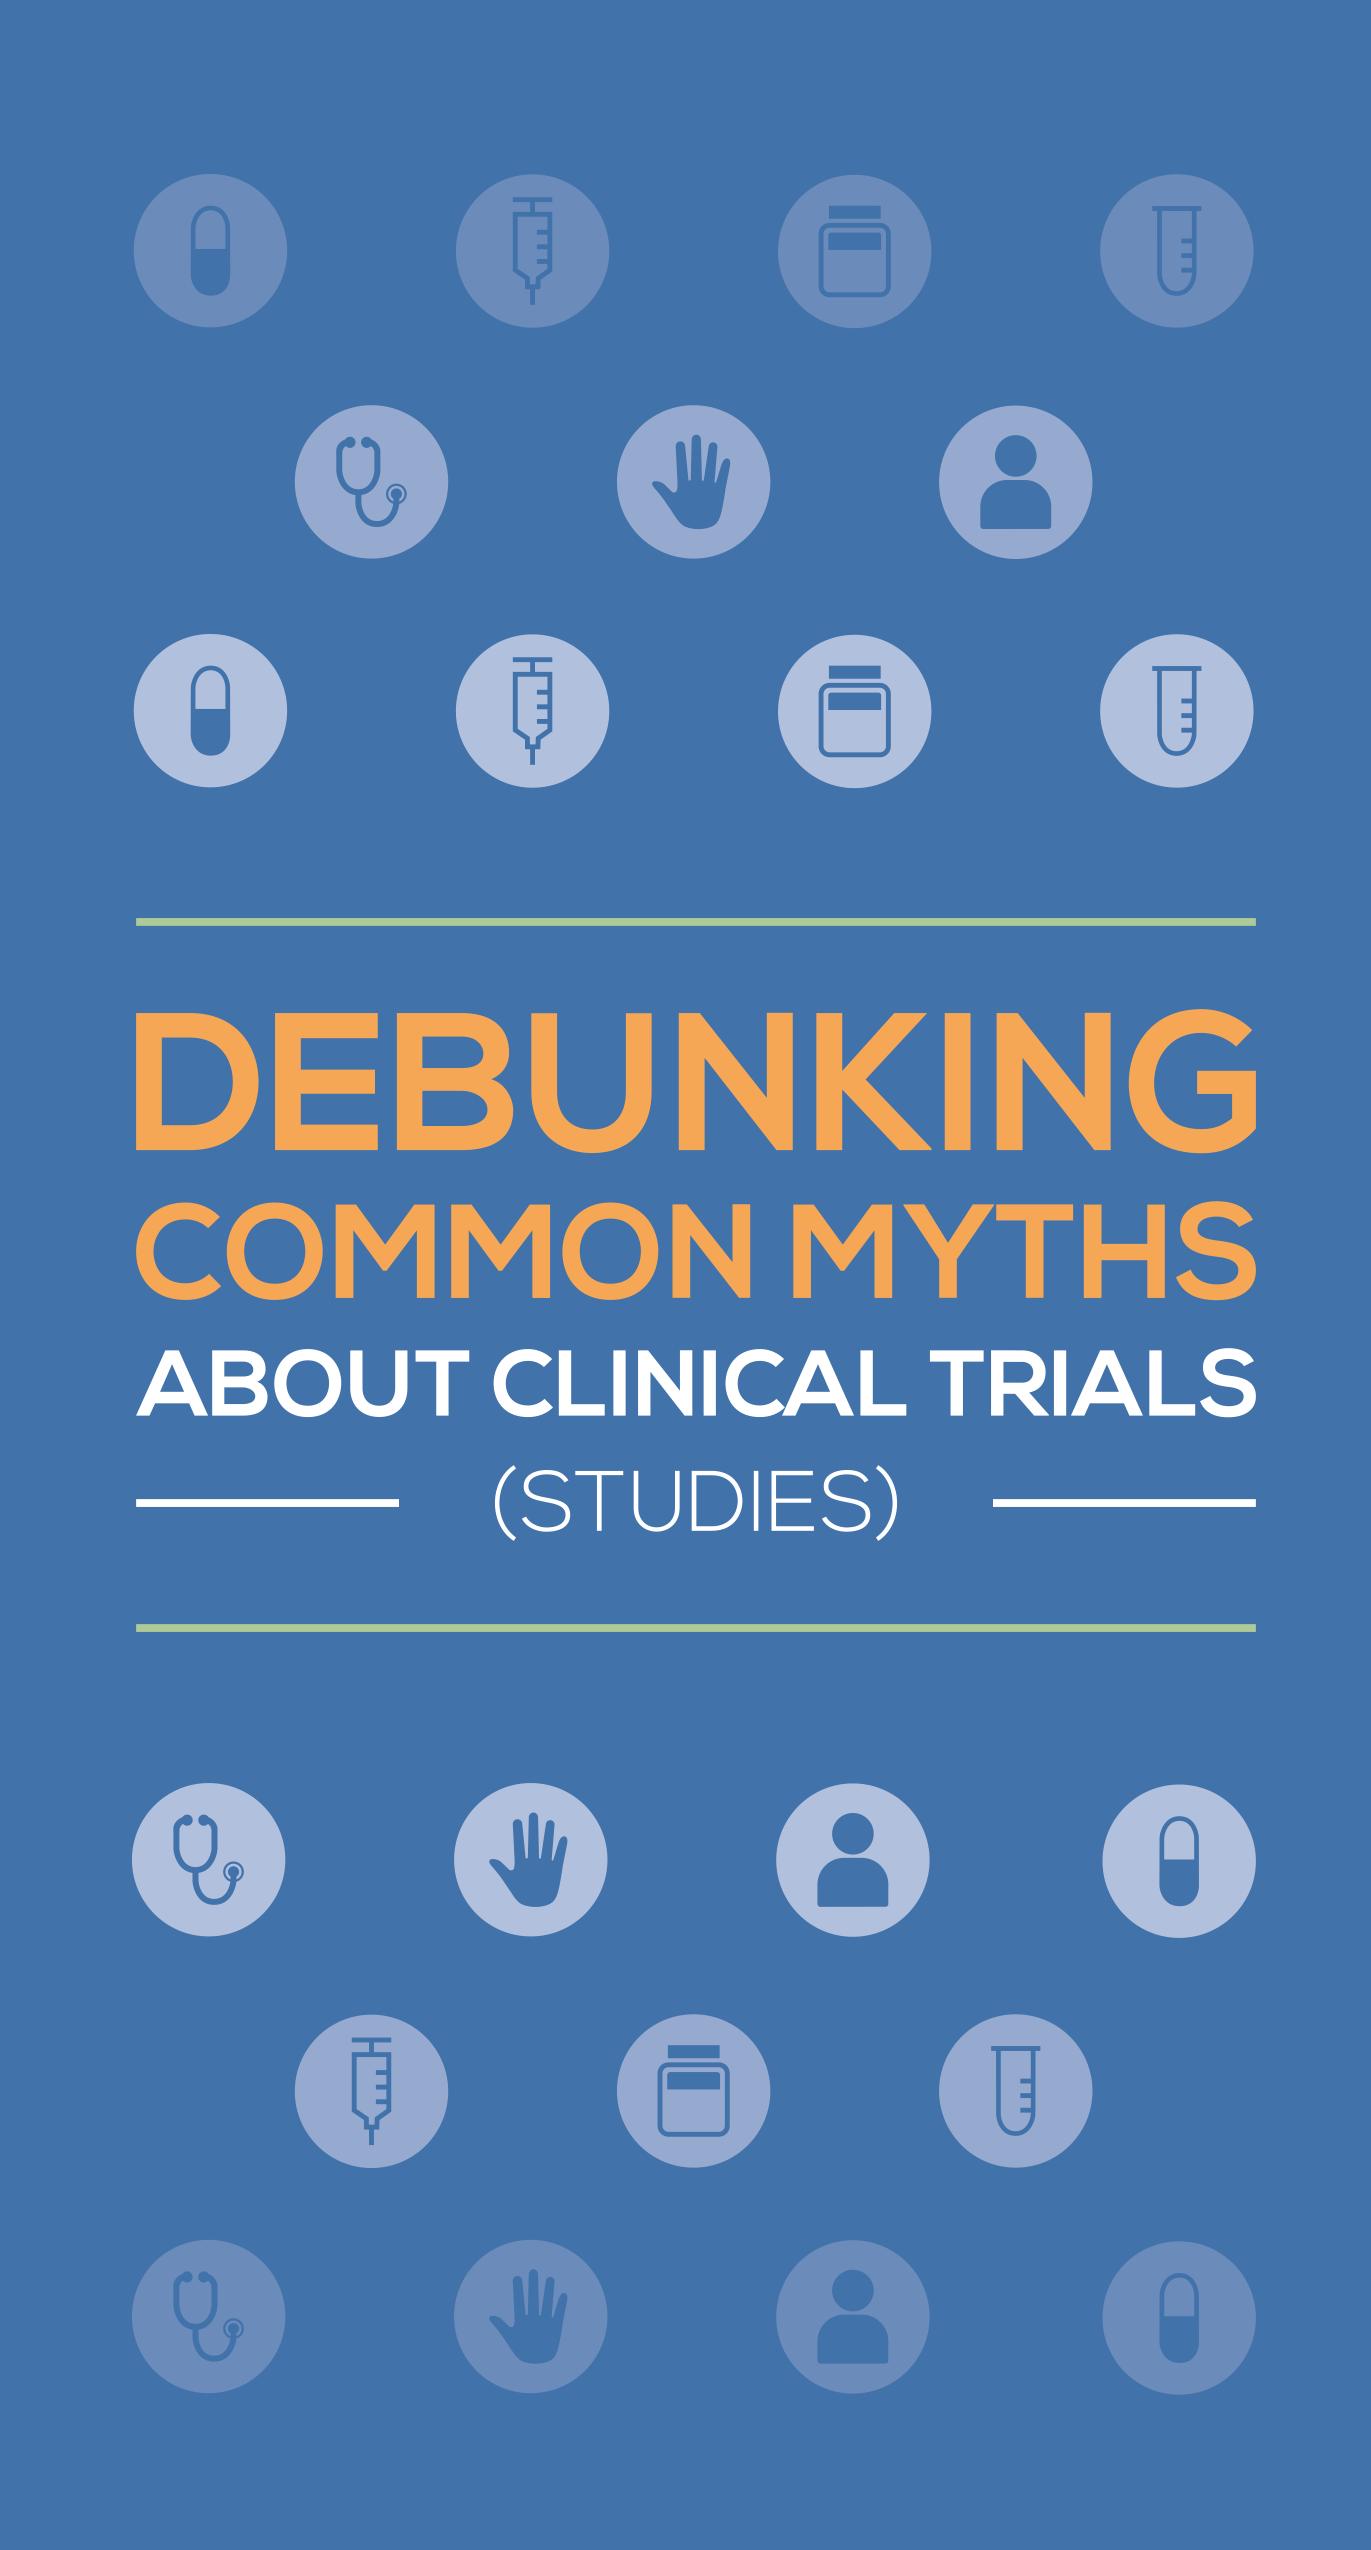 Debunking_Myths_FINAL-1